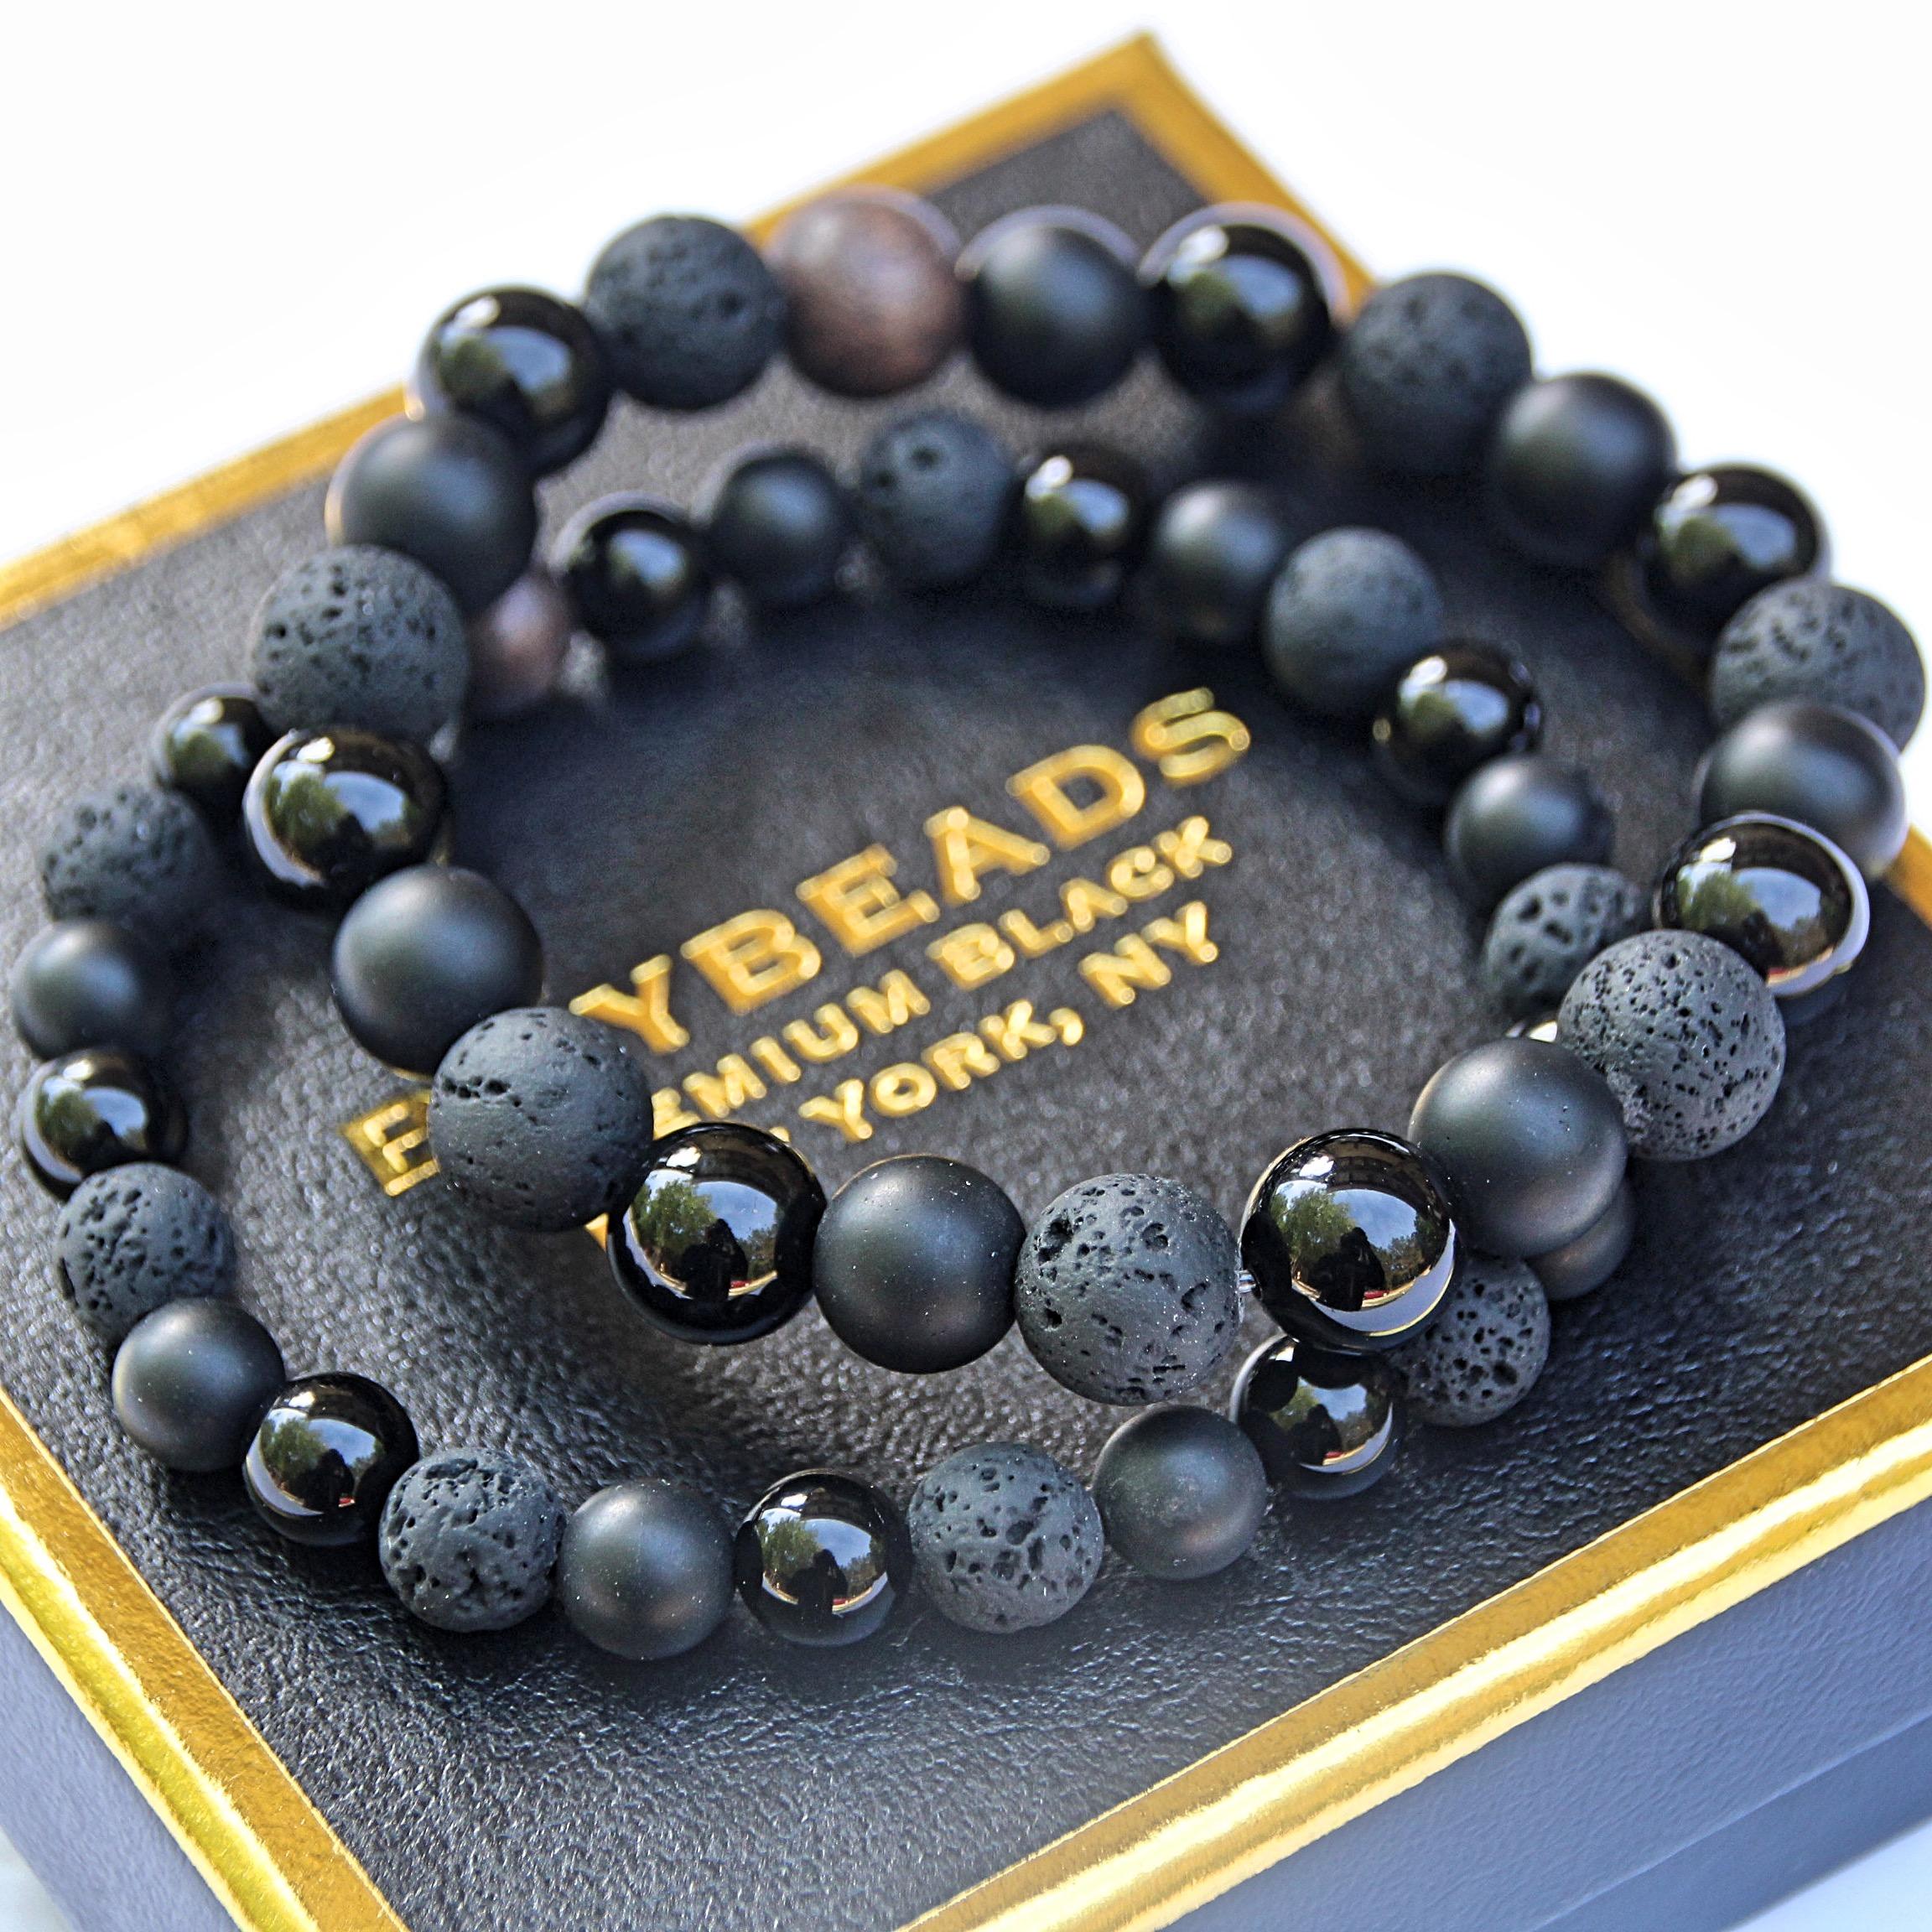 boybeads-lonnie-lapis-lazuli-bead-bracelet-for-guys-men-custom-beads-blue-beads-2021-abel-lava-black-onyx.jpg